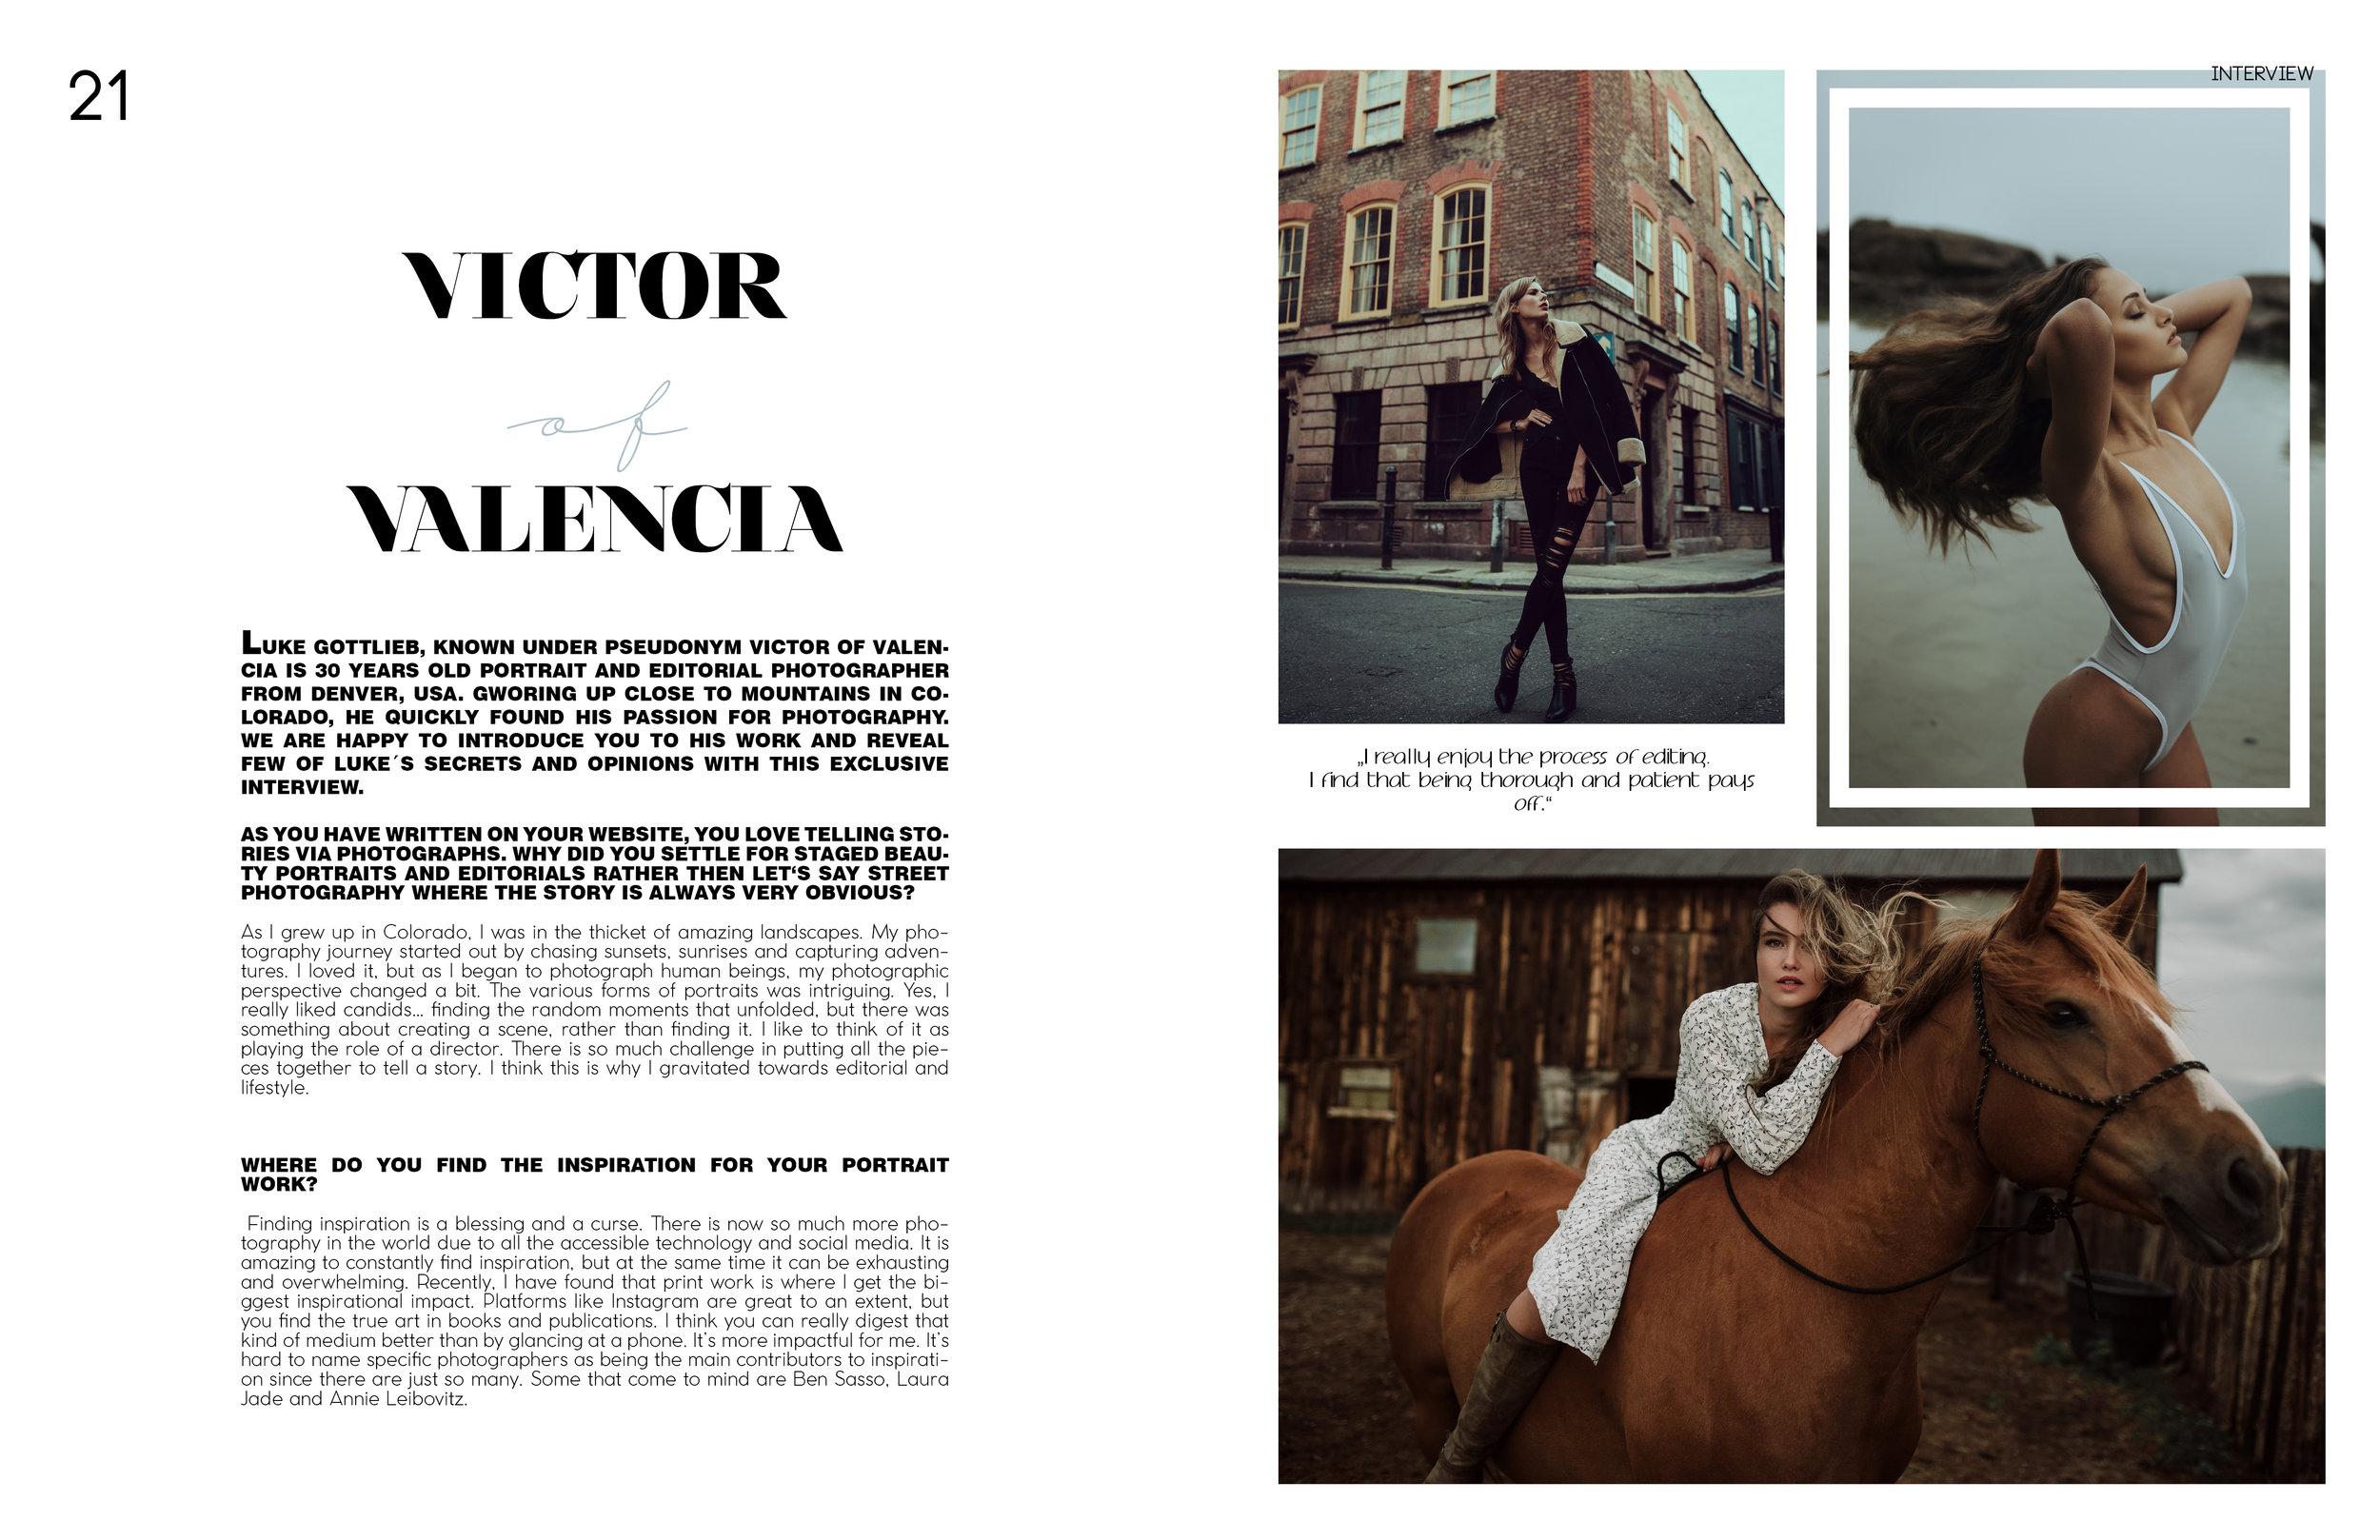 Victor of Valencia in Eloque magazine Issue 5, 2018